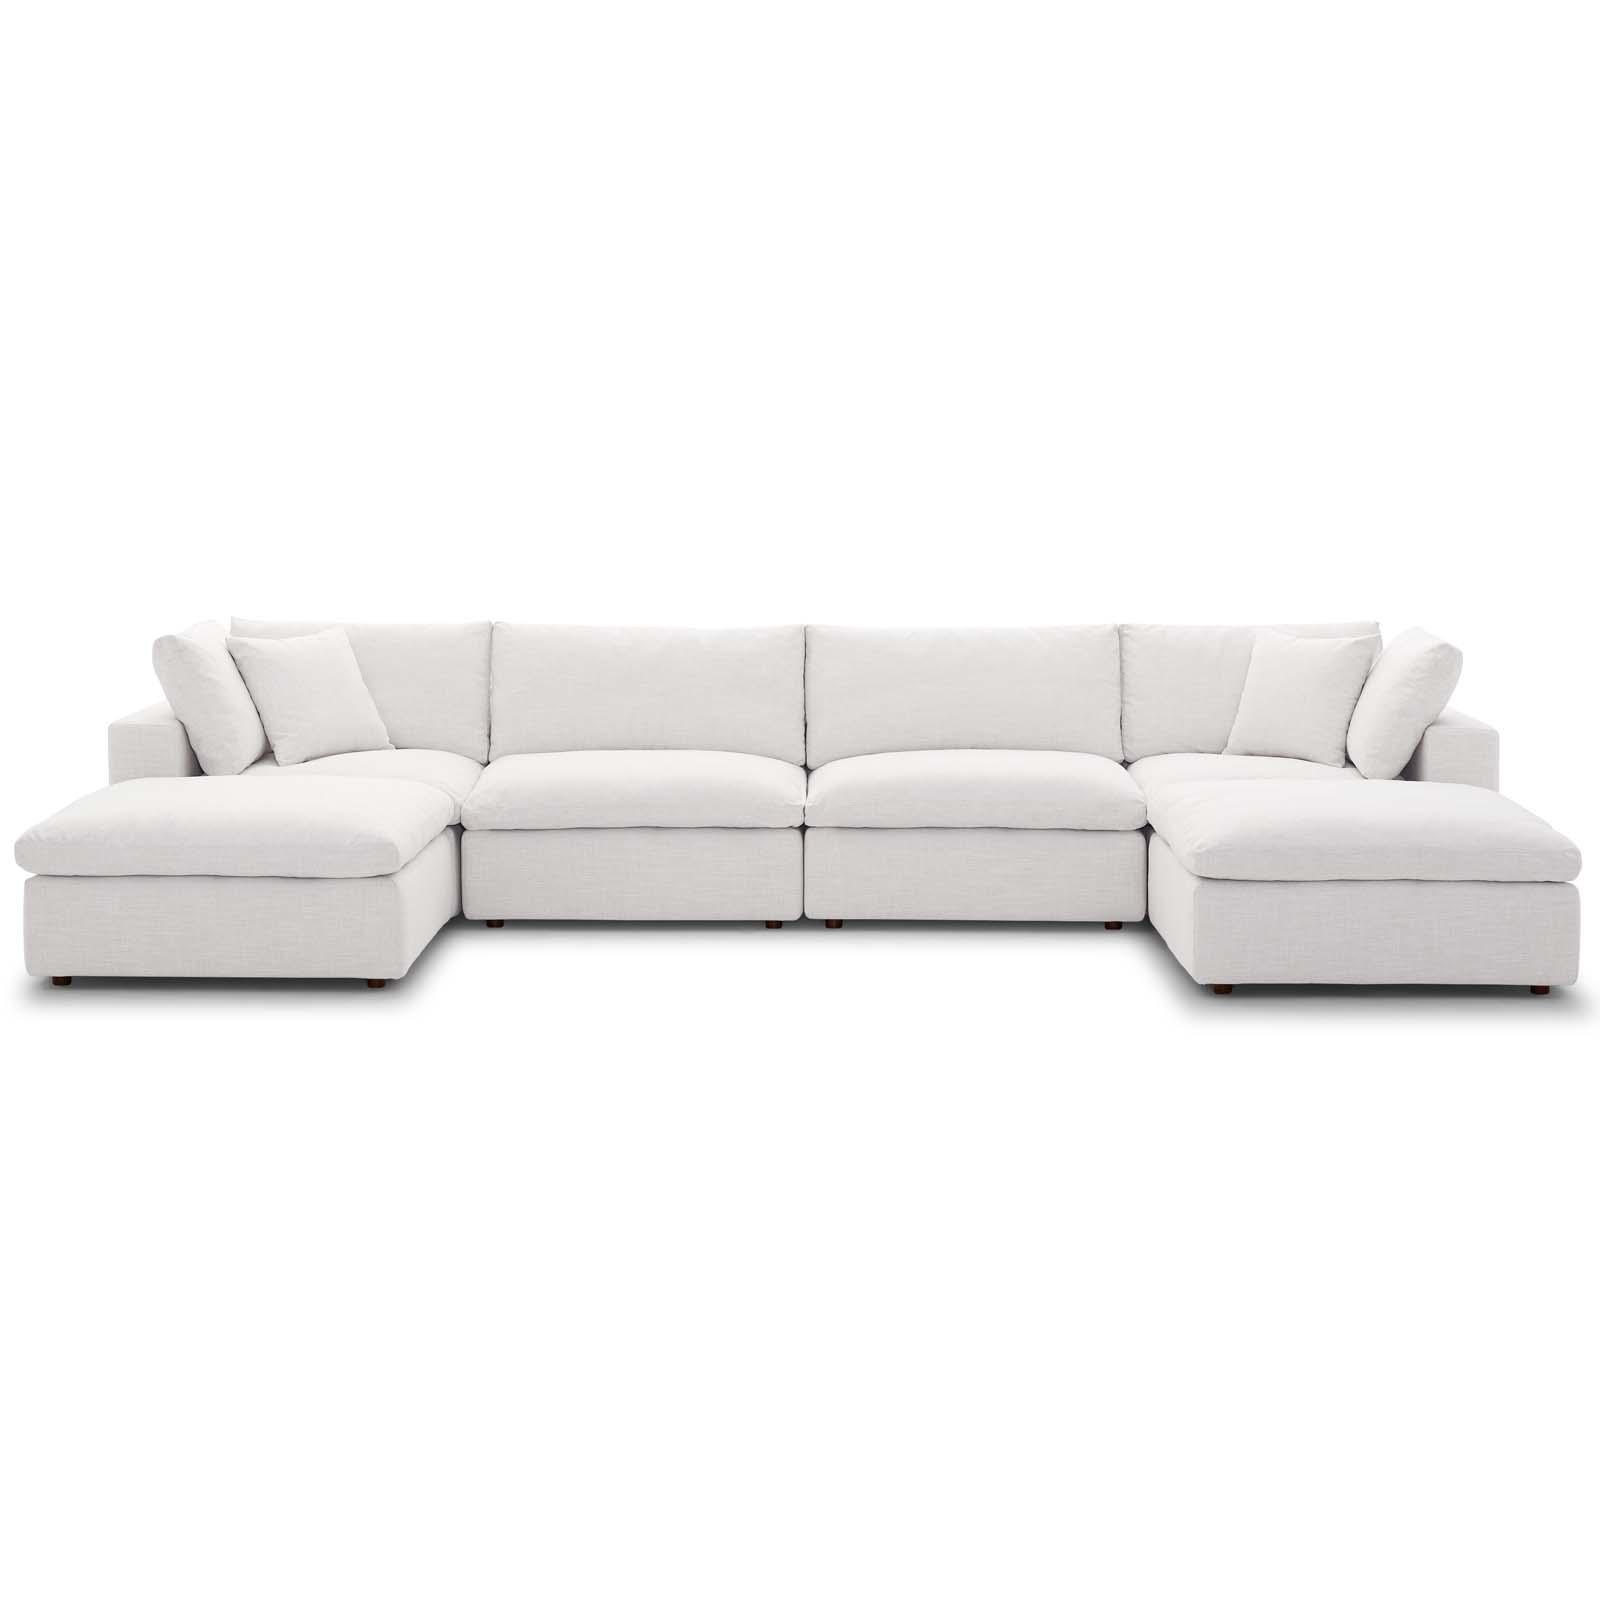 commix down filled overstuffed 6 piece sectional sofa set beige